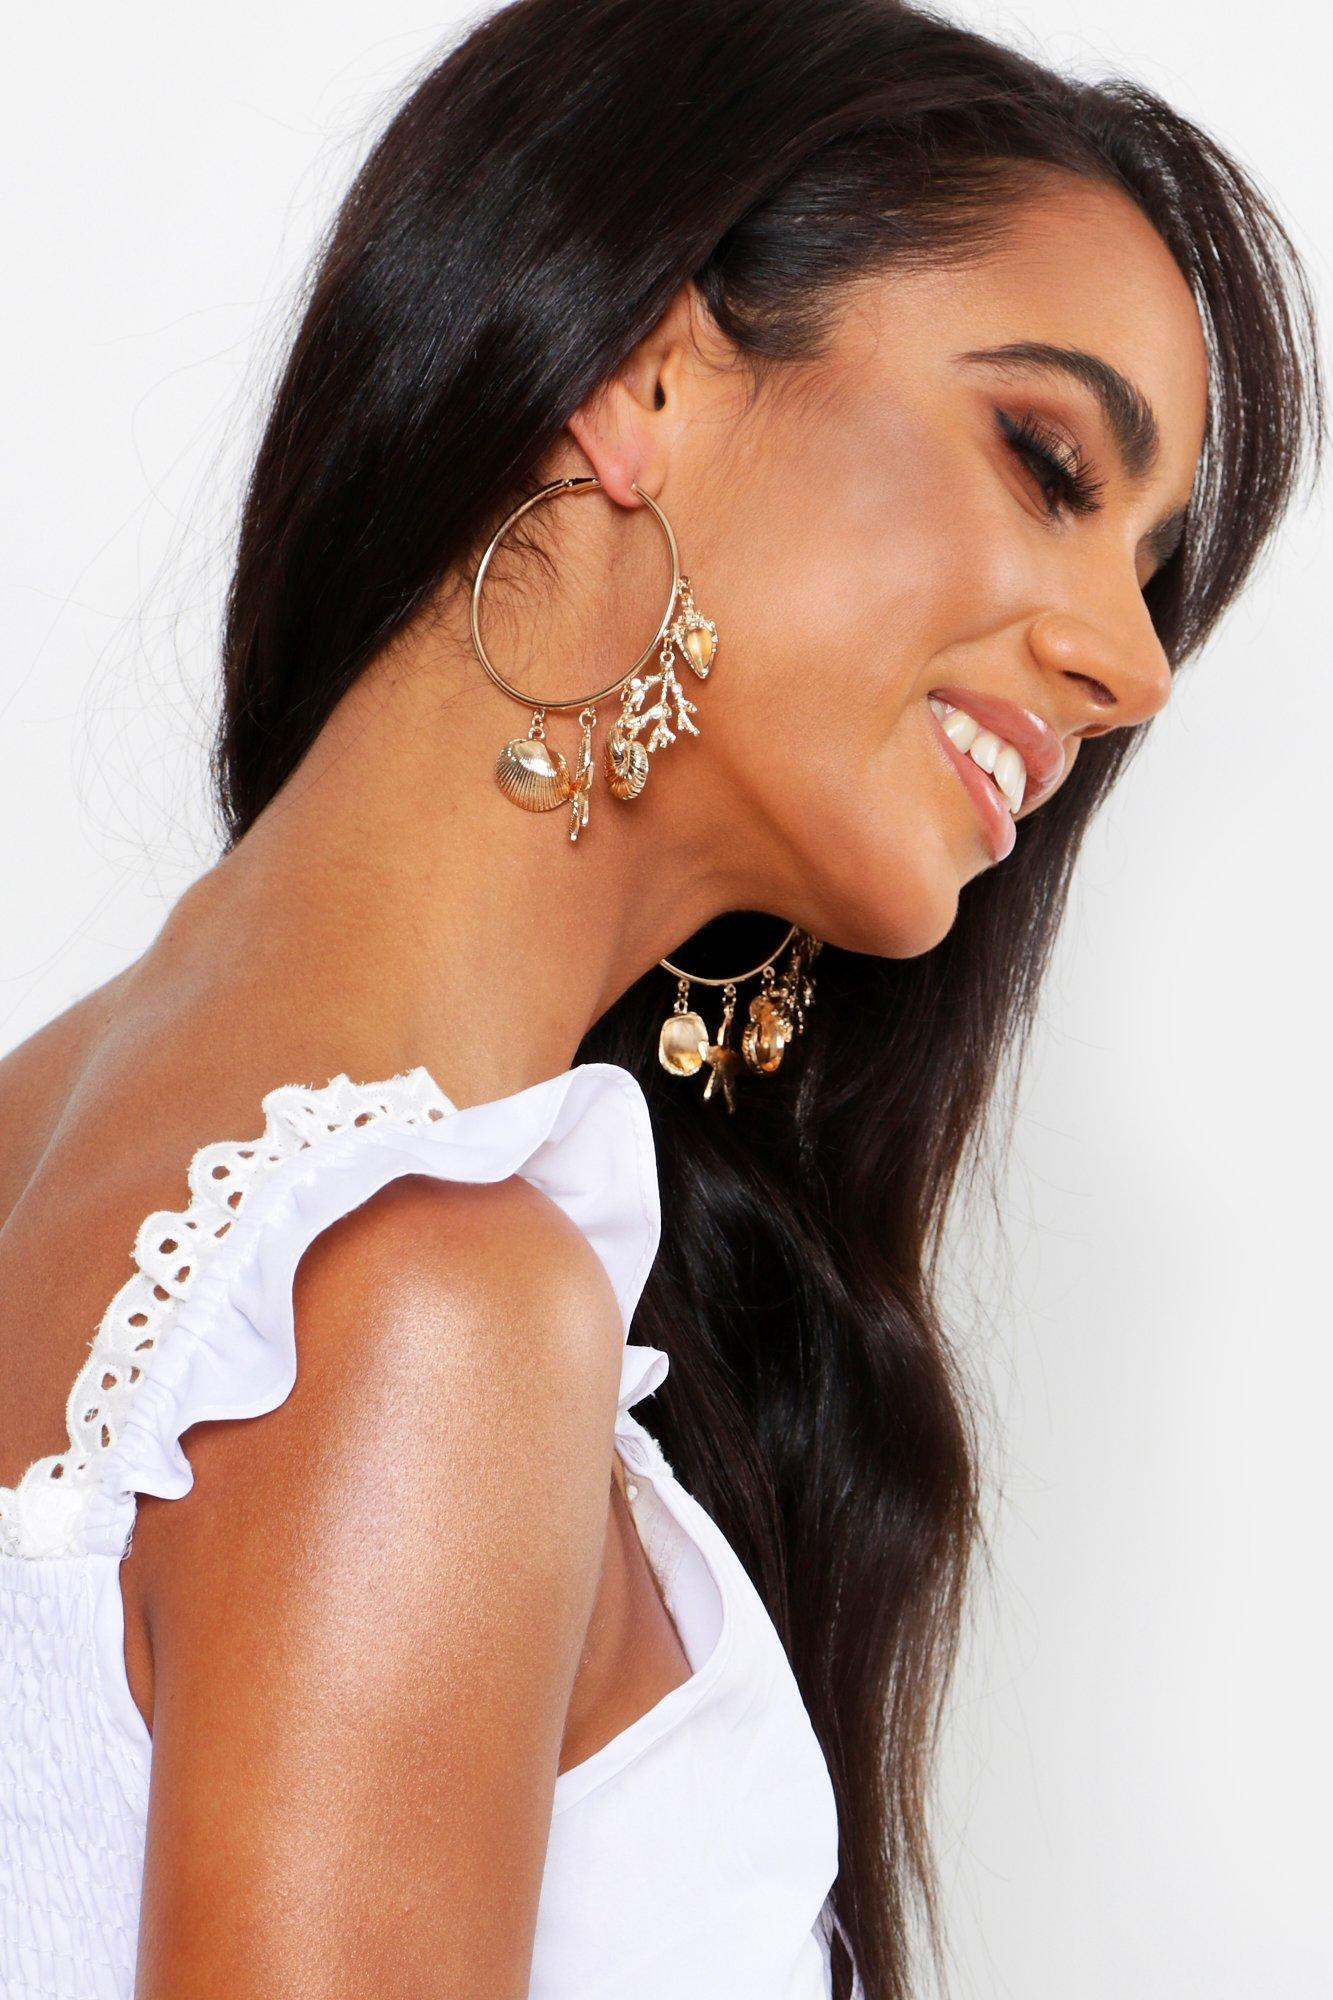 Купить Jewellery, Seashell Charm Hoop Earrings, boohoo